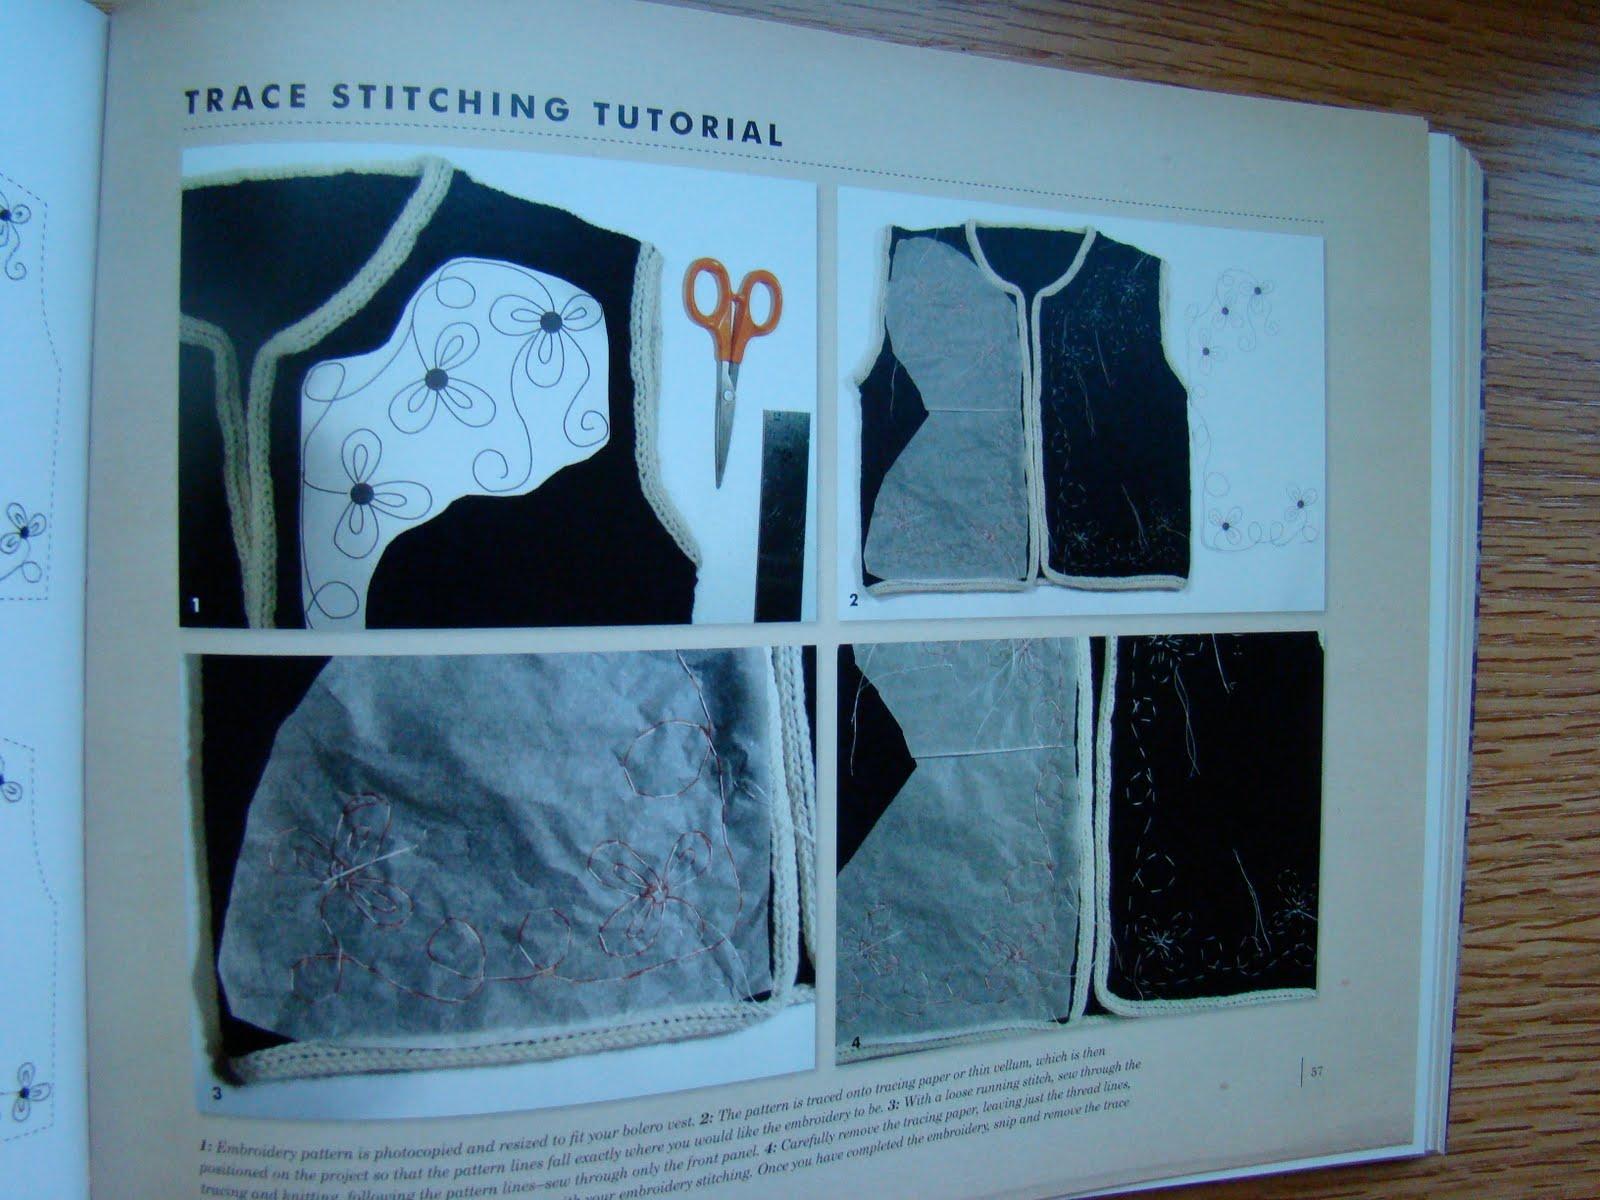 Chicago Knitting Mills : Susan b anderson sep